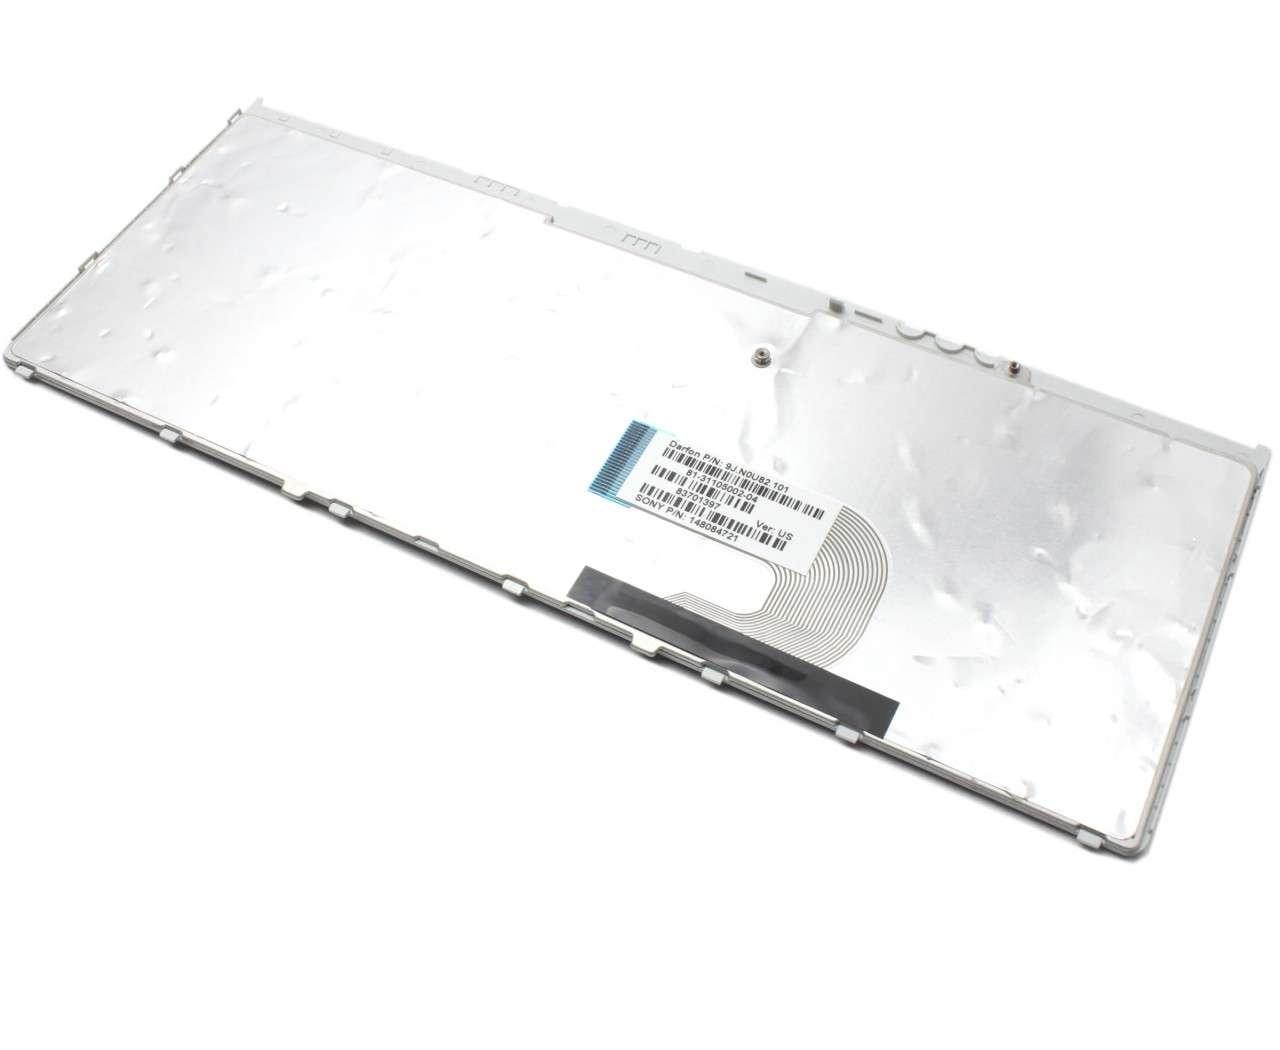 Tastatura Sony Vaio VGN-FW93XS neagra cu rama gri imagine powerlaptop.ro 2021